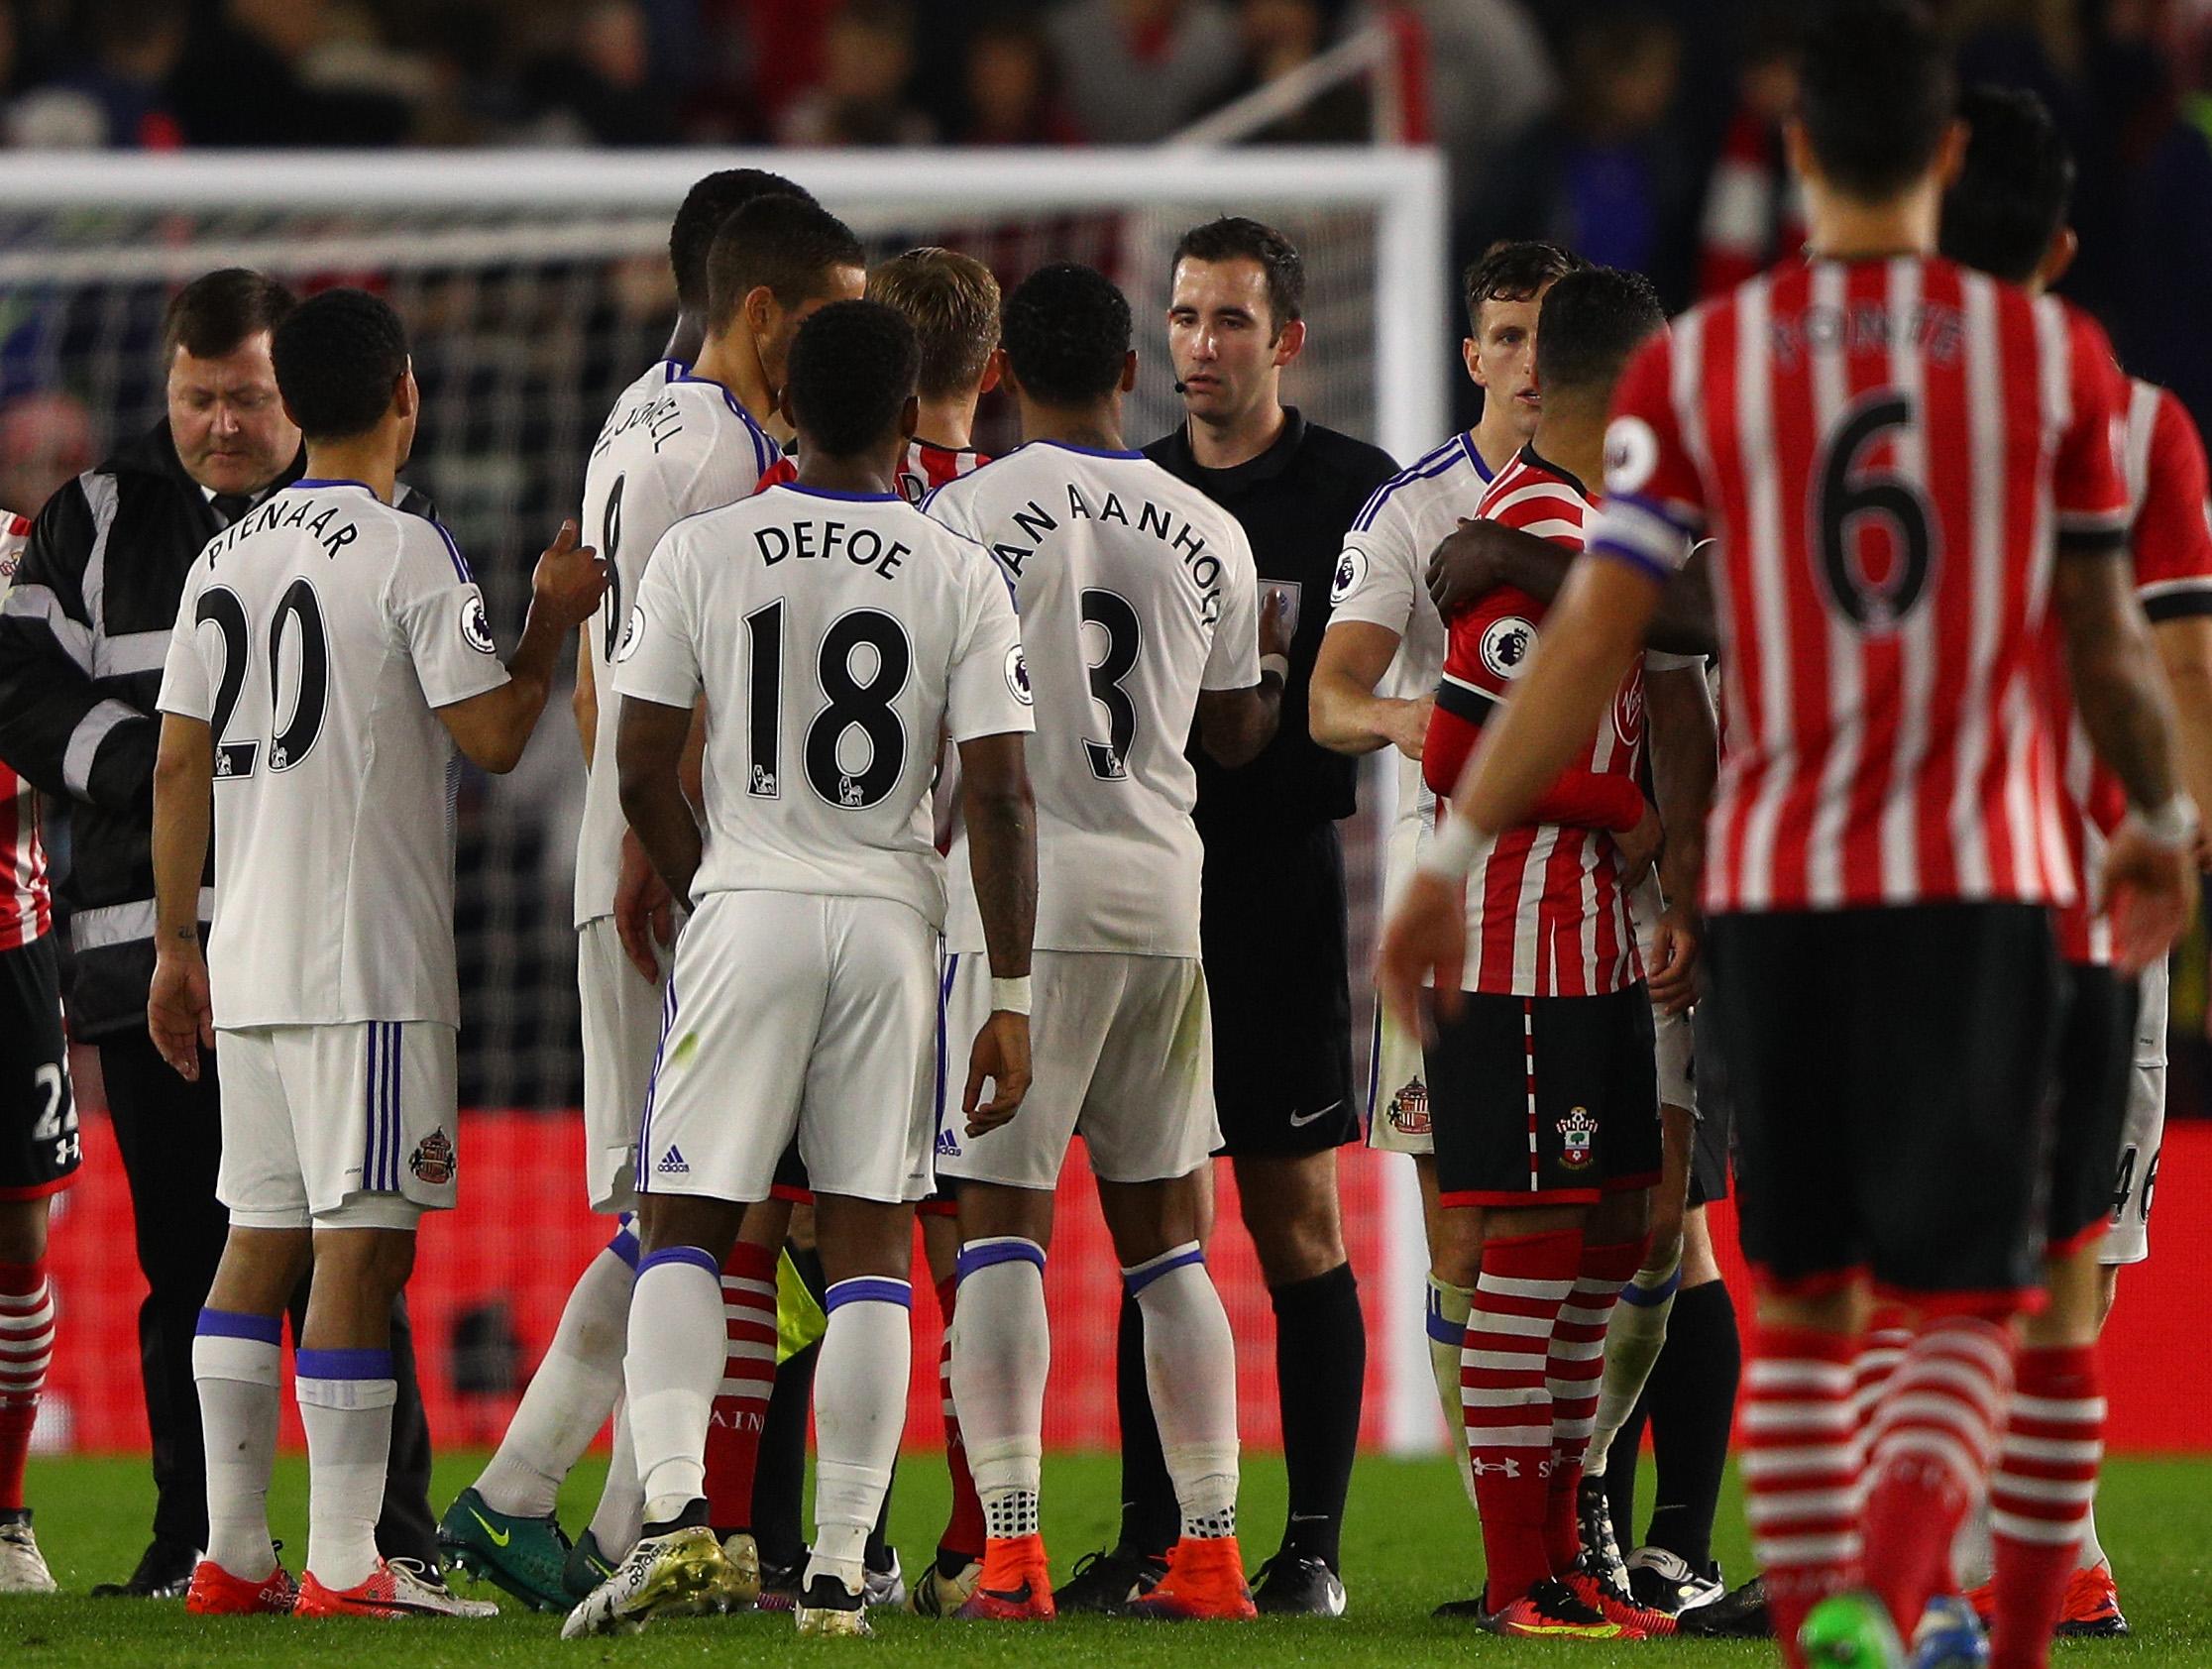 Moyes looks to Sunderland to build on Palace win